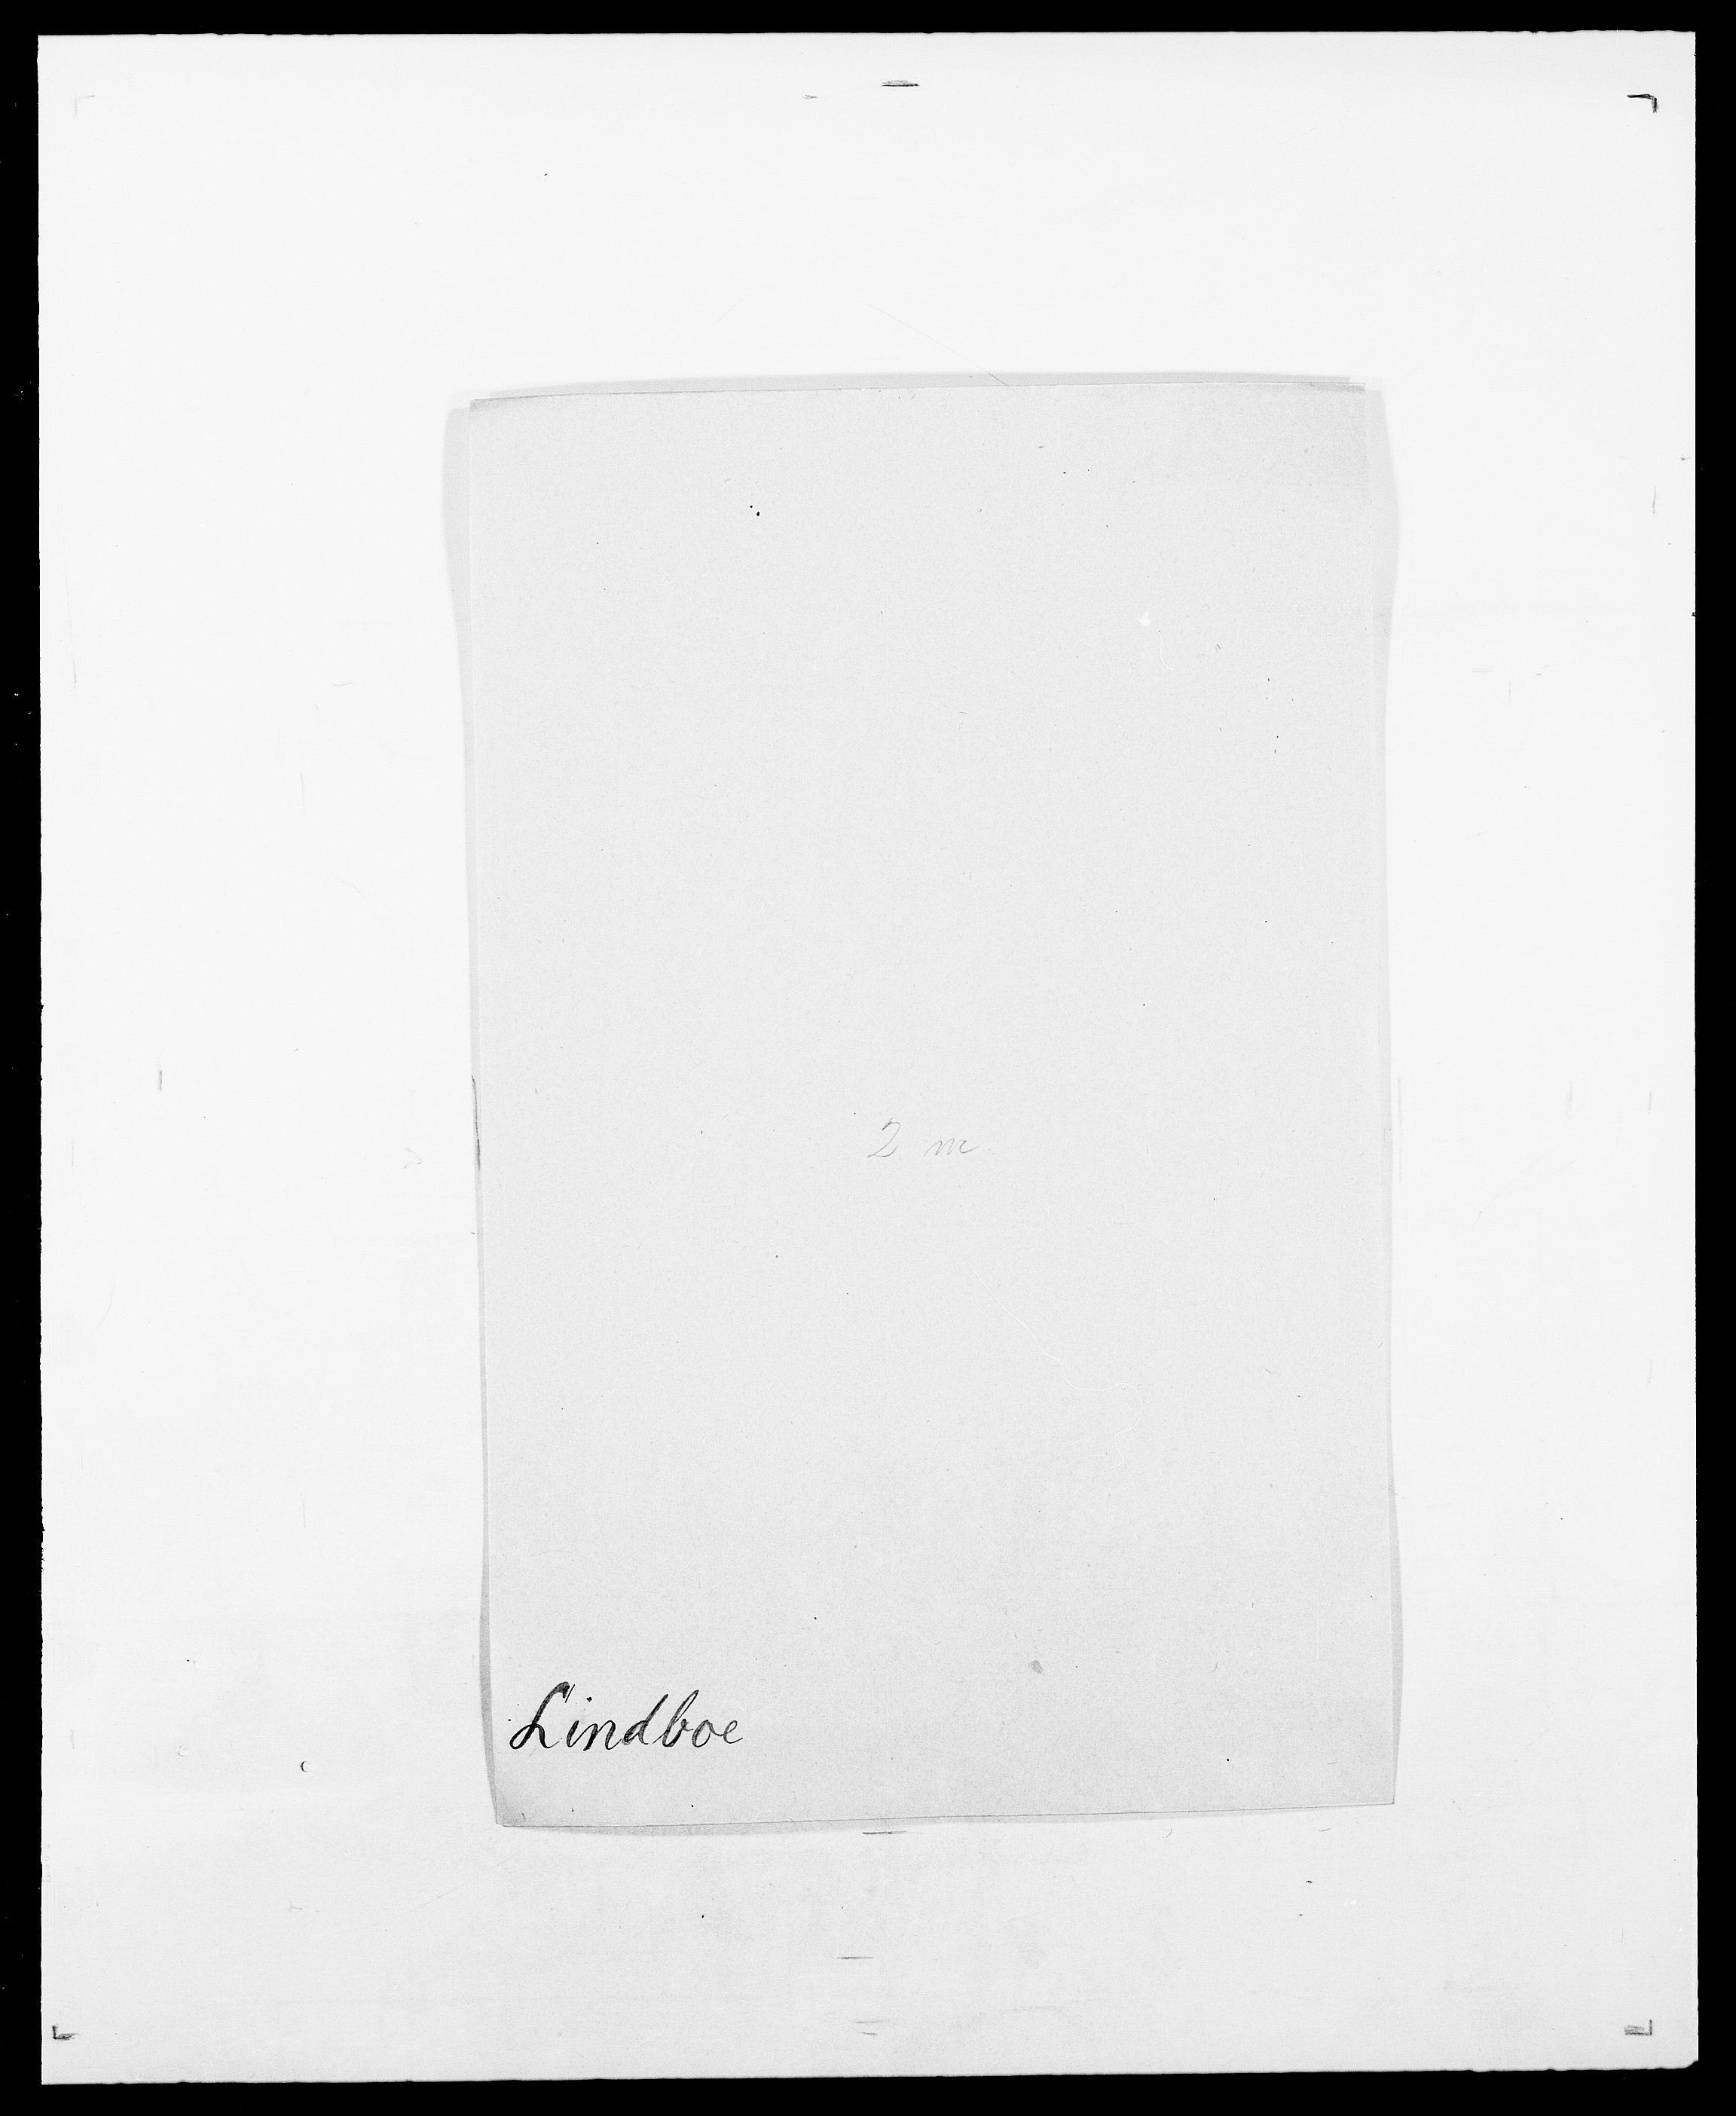 SAO, Delgobe, Charles Antoine - samling, D/Da/L0023: Lau - Lirvyn, s. 569